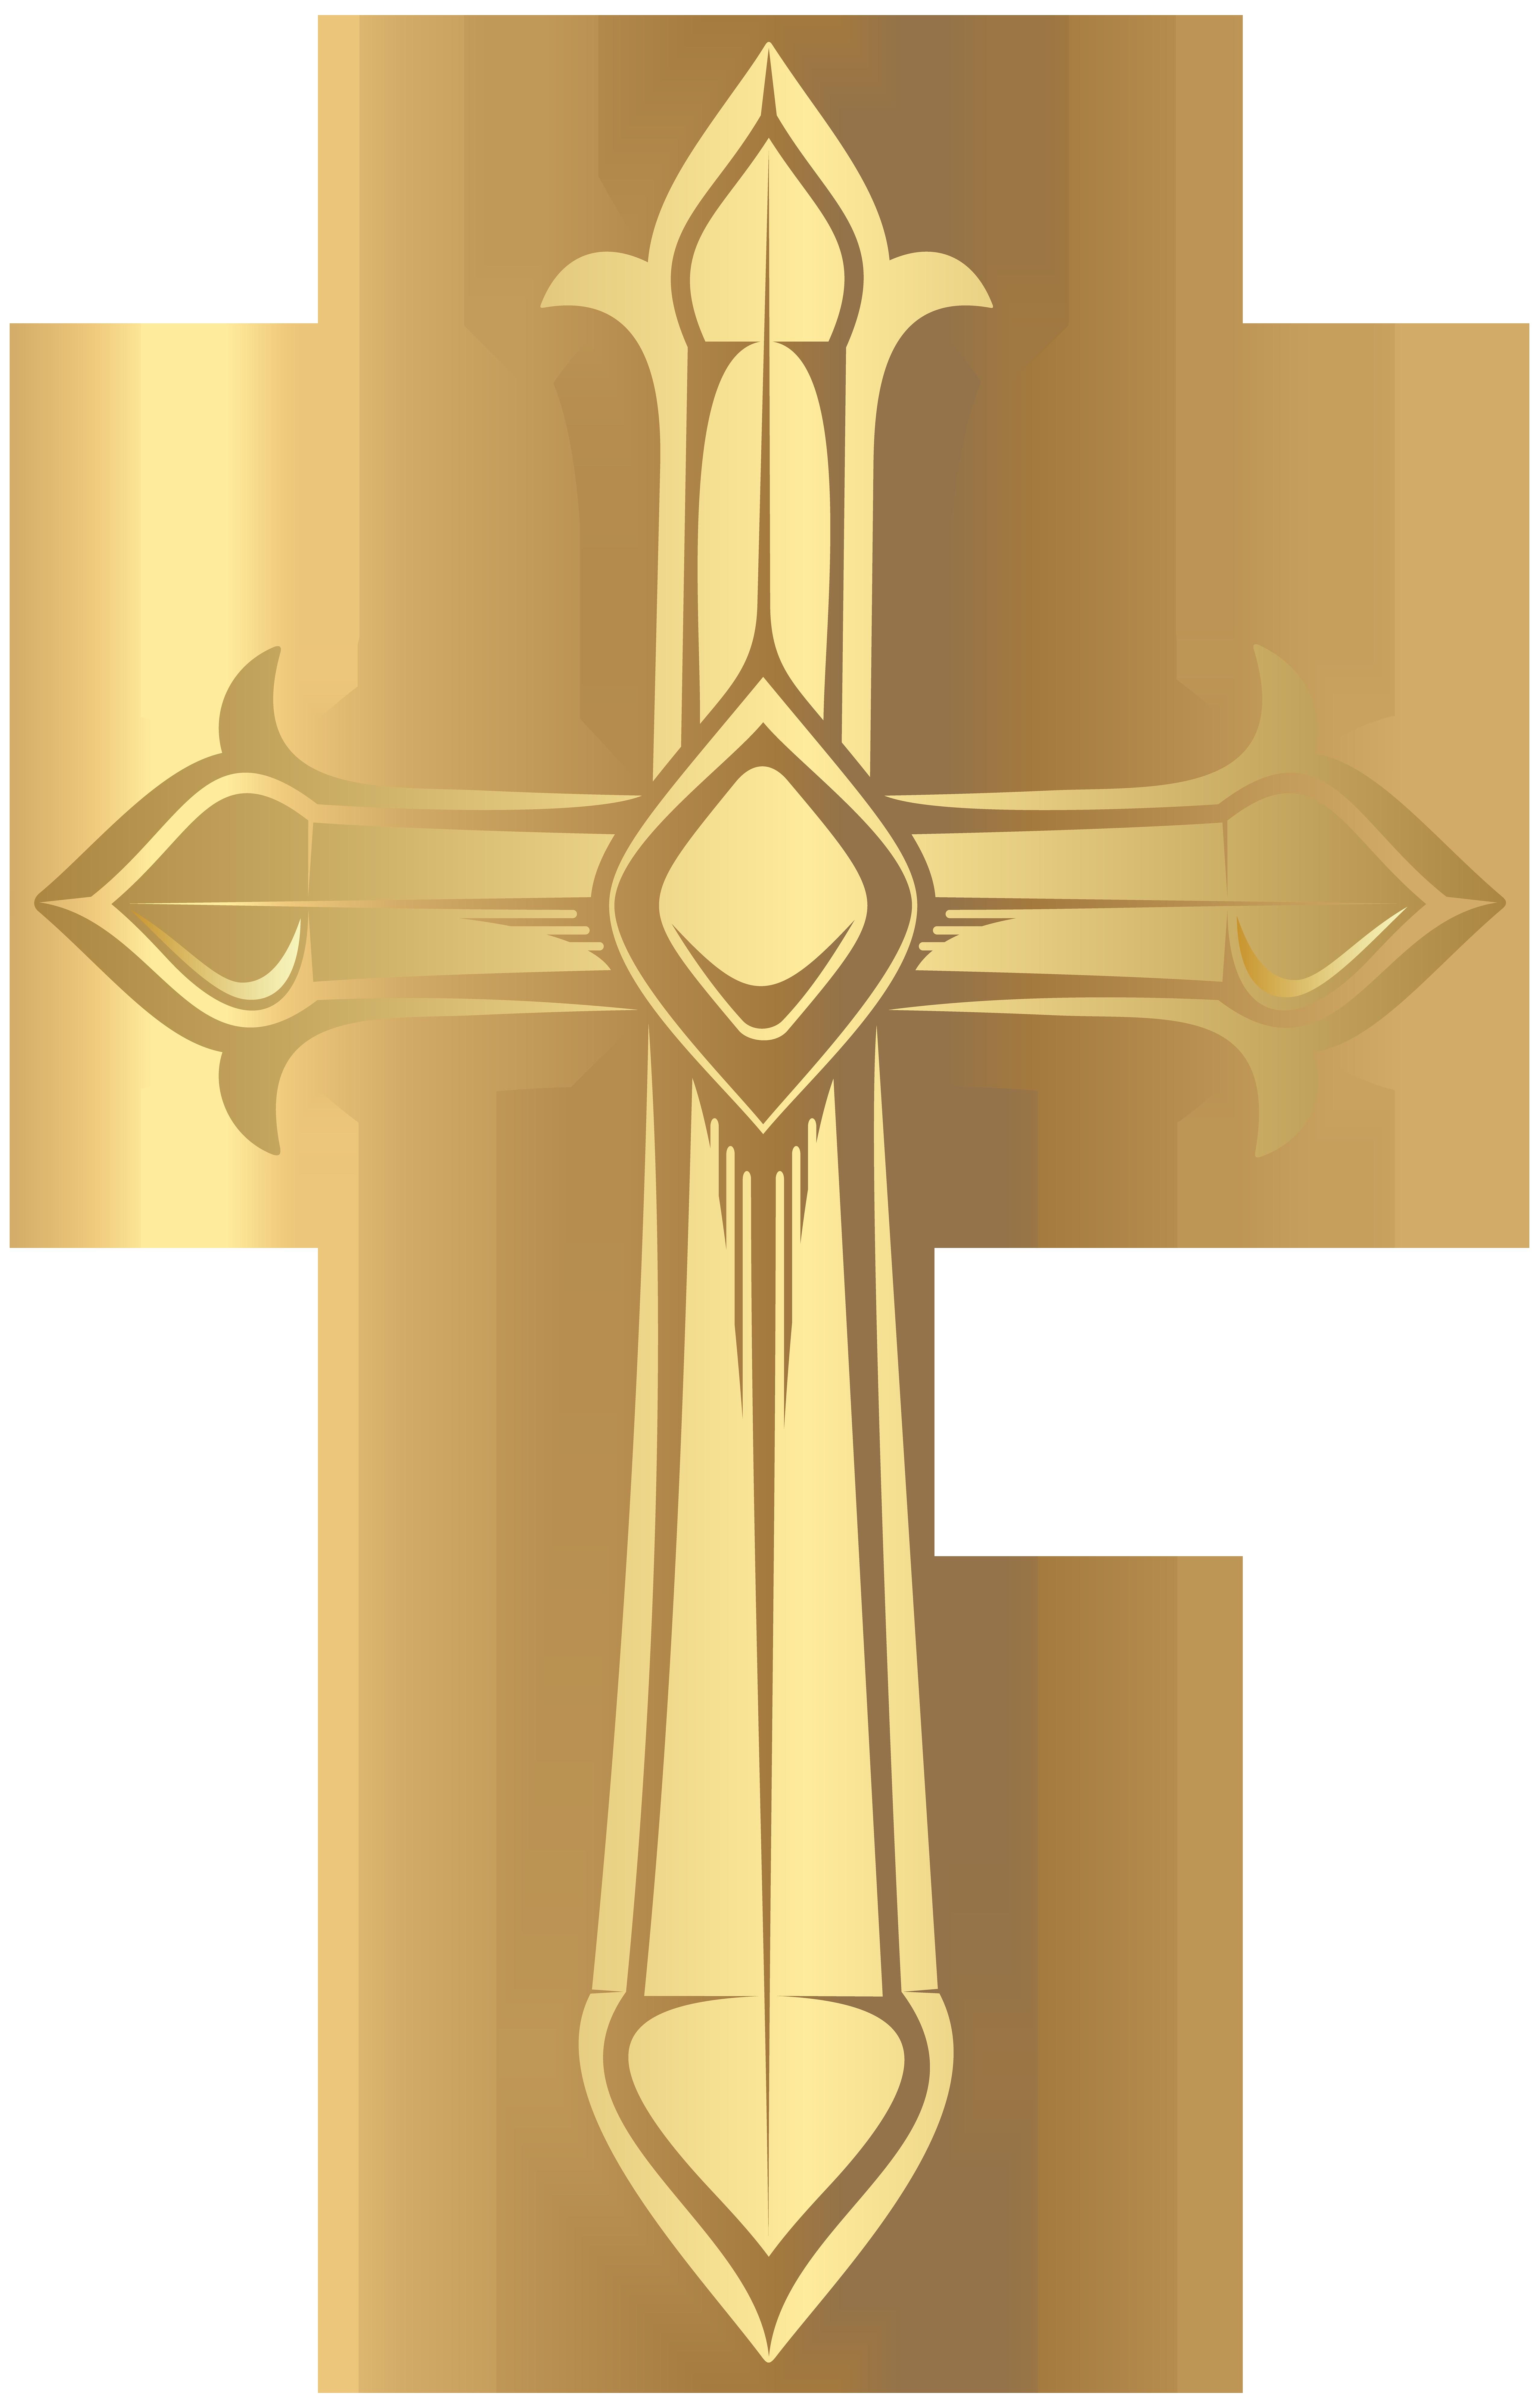 Symbols Category Cross Image It Is Of Type It Is